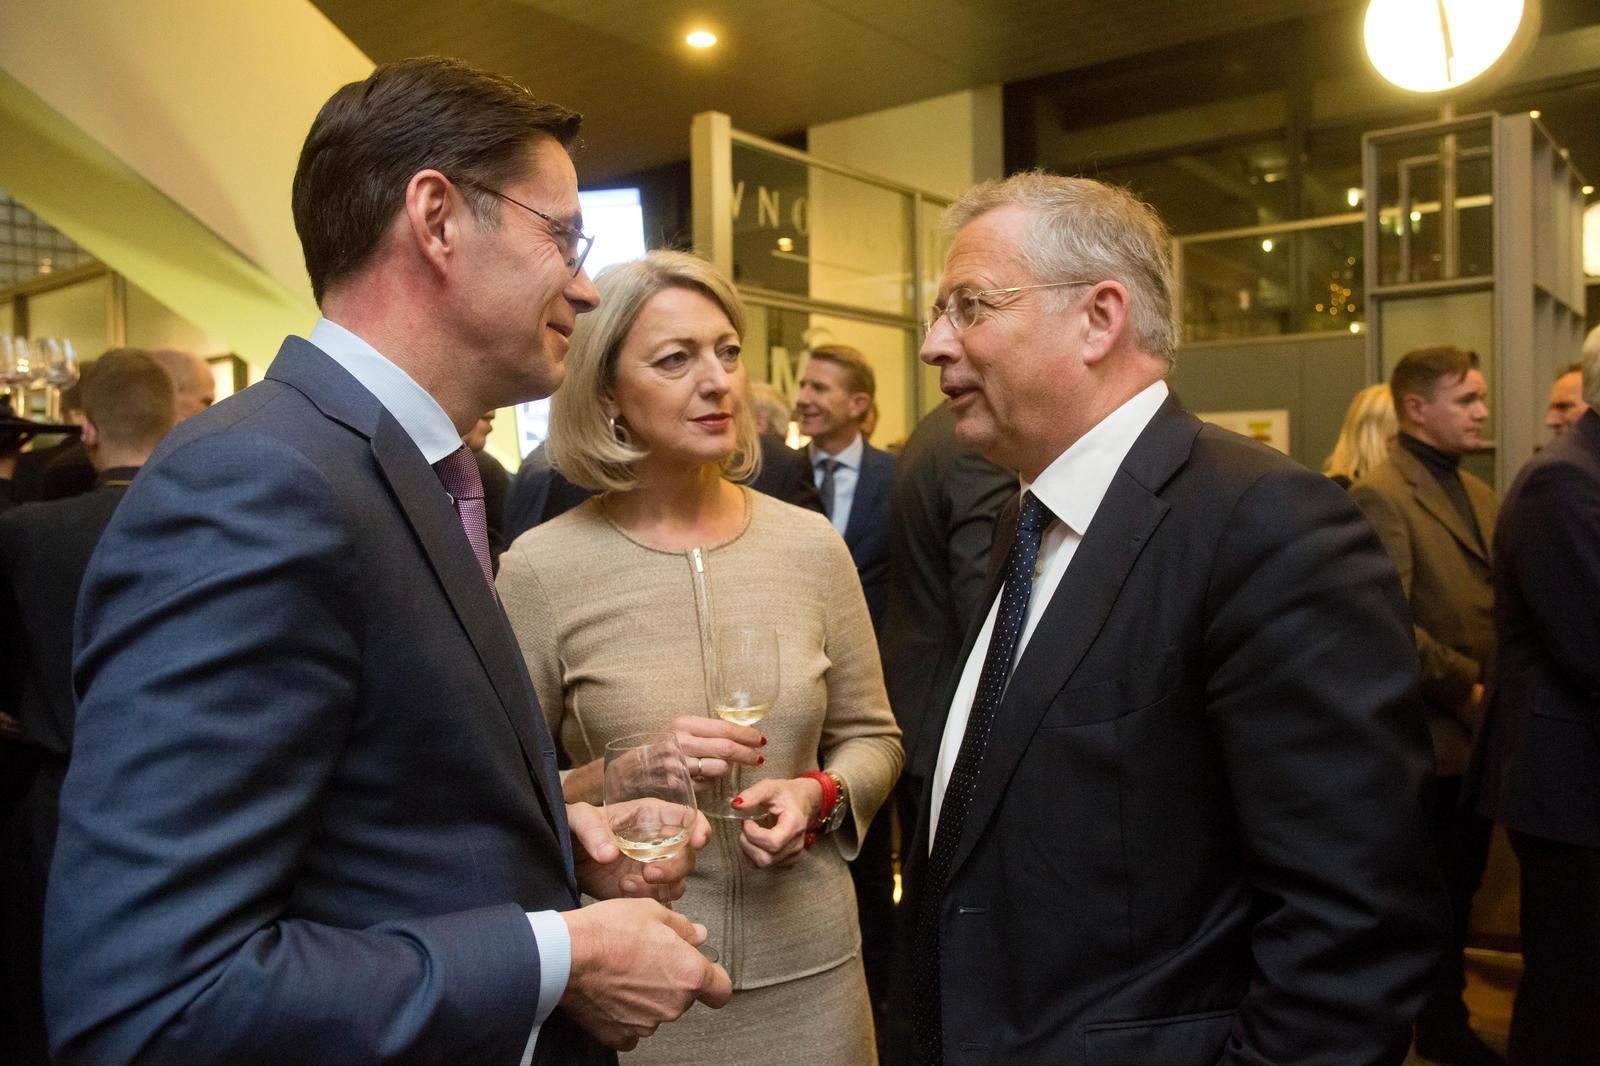 Cees Oudshoorn (algemeen directeur VNO-NCW en MKB-Nederland), Ineke Dezentjé Hamming-Bluemink (voorzitter FME) en Paul de Krom (ceo TNO).